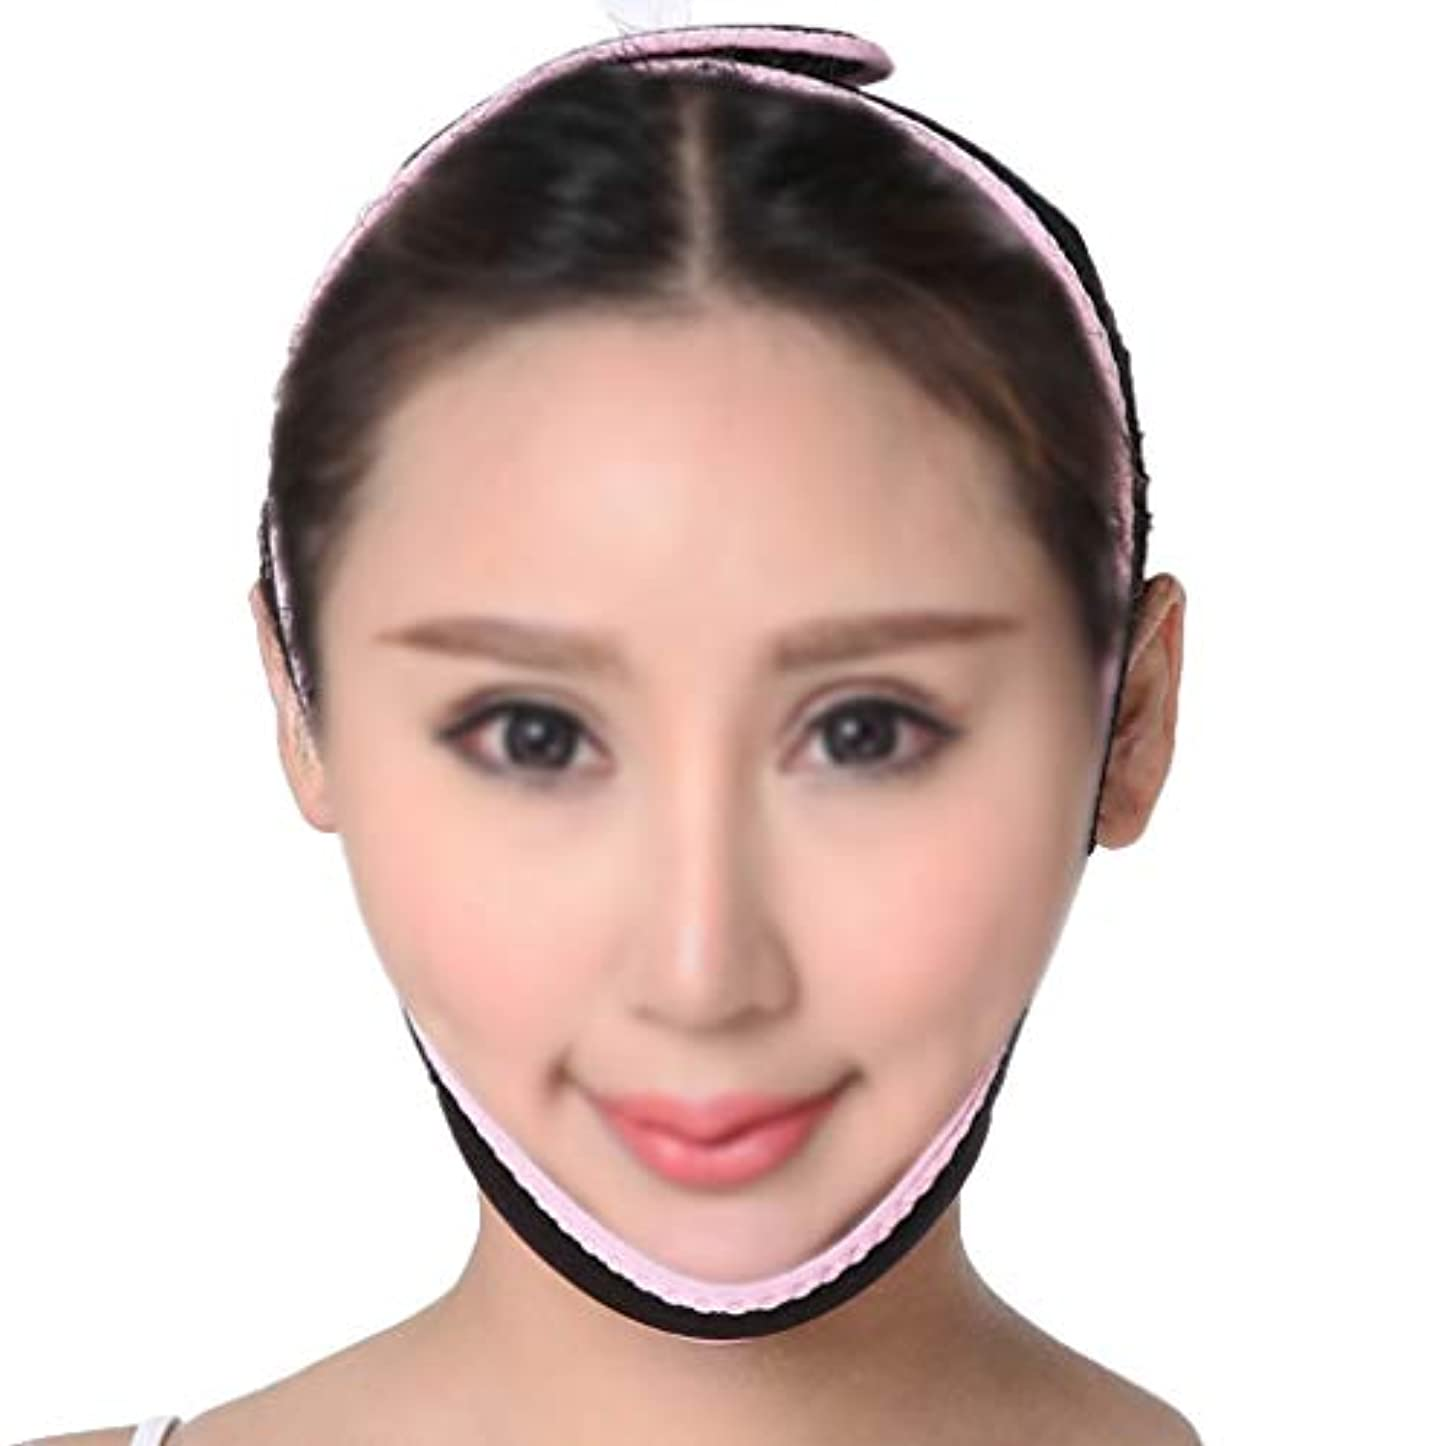 GLJJQMY 引き締めマスク薄い顔面マスクフェイスリフティング器具V顔薄い顔面包帯薄い顔マッサージ器薄い顔面マスクフェイスリフティング装置 顔用整形マスク